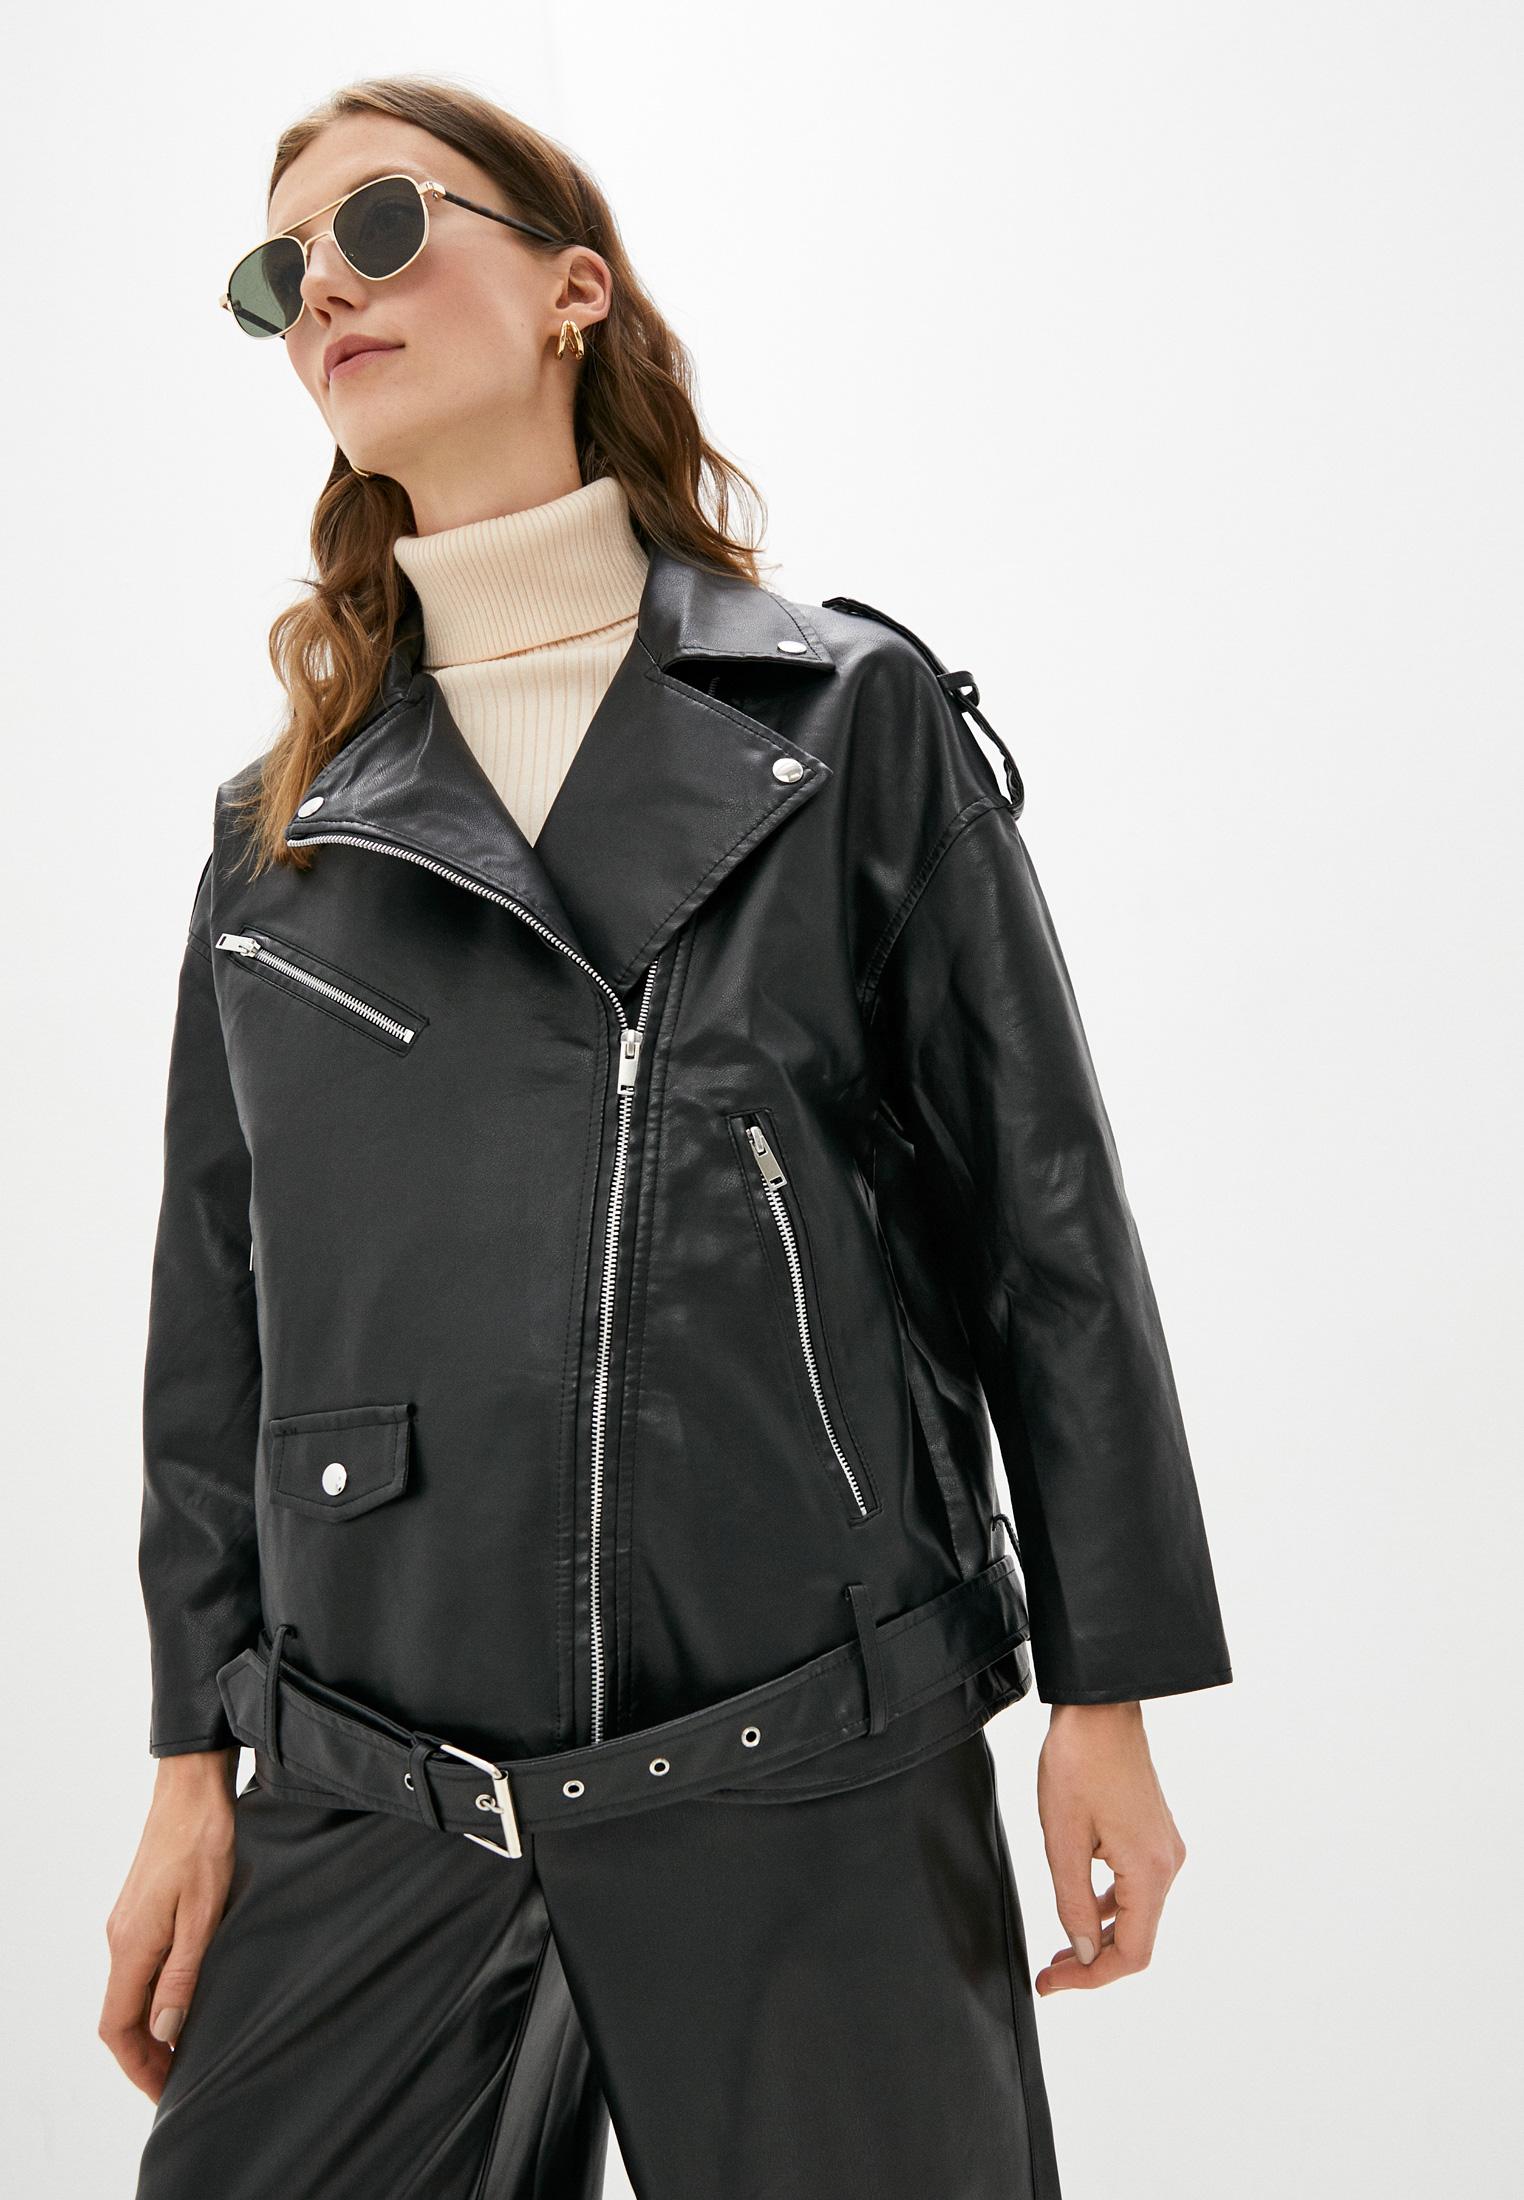 Кожаная куртка Diverius Куртка кожаная Diverius